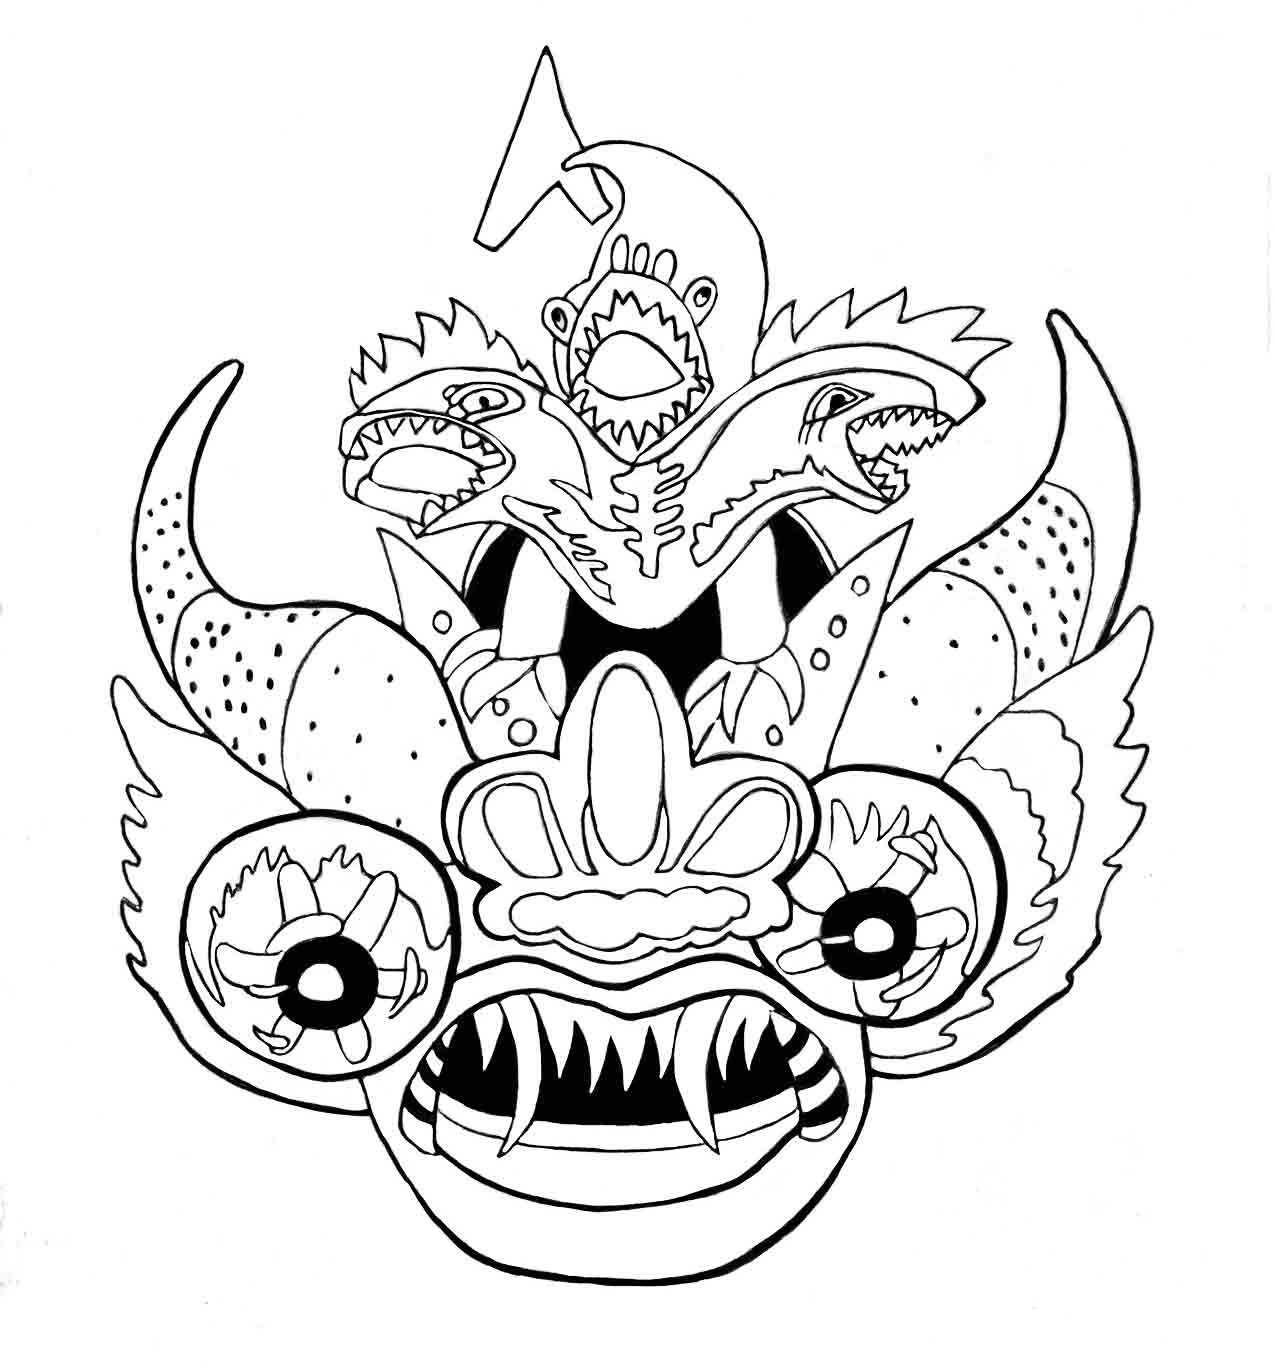 Jose Portugal Catacora: Mascara de la diablada para pintar